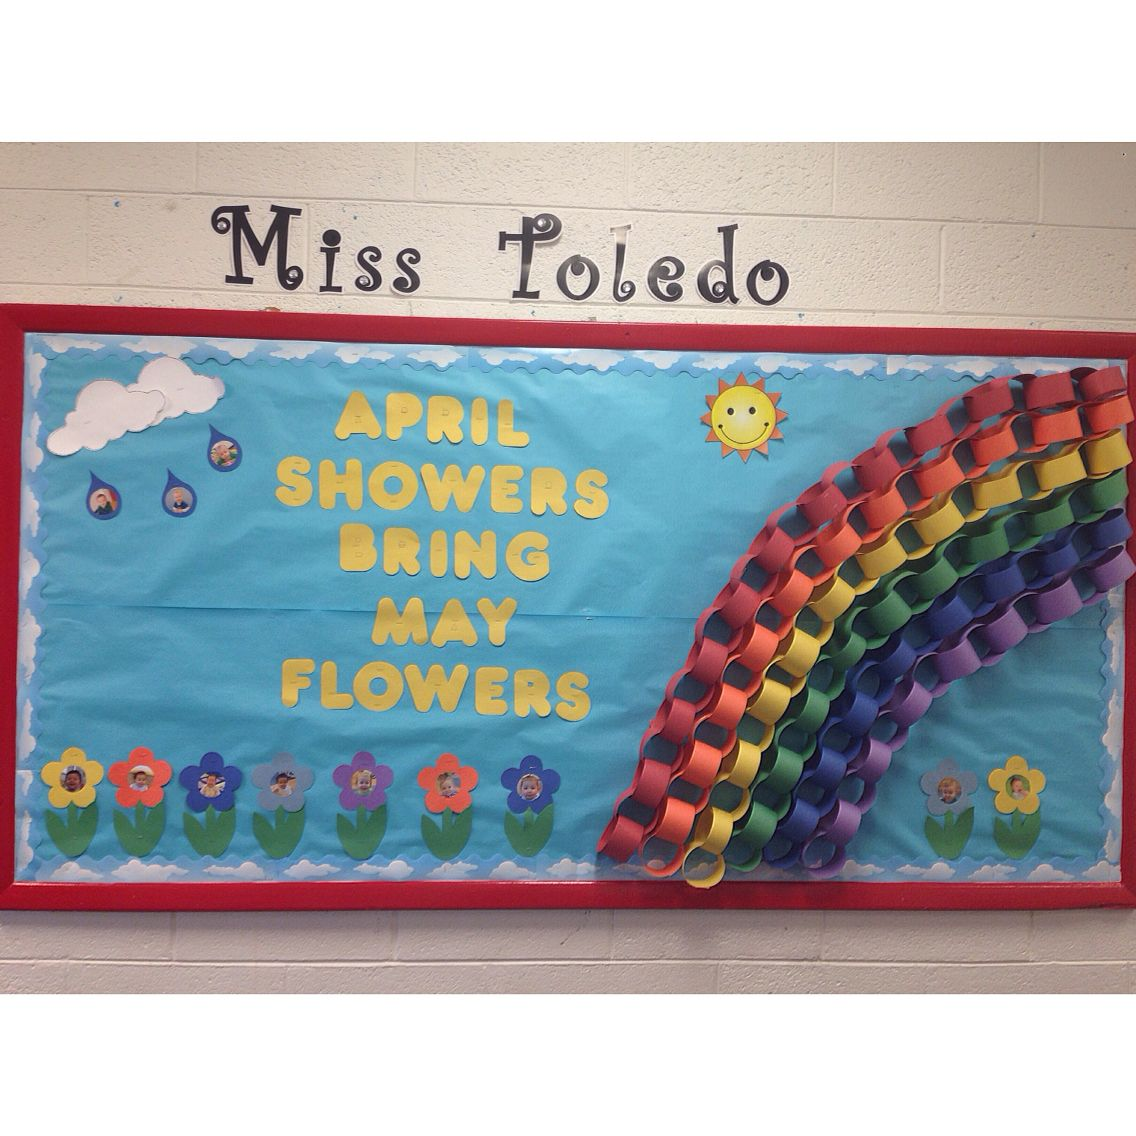 april showers bring may flowers bulletin board. april 2015.